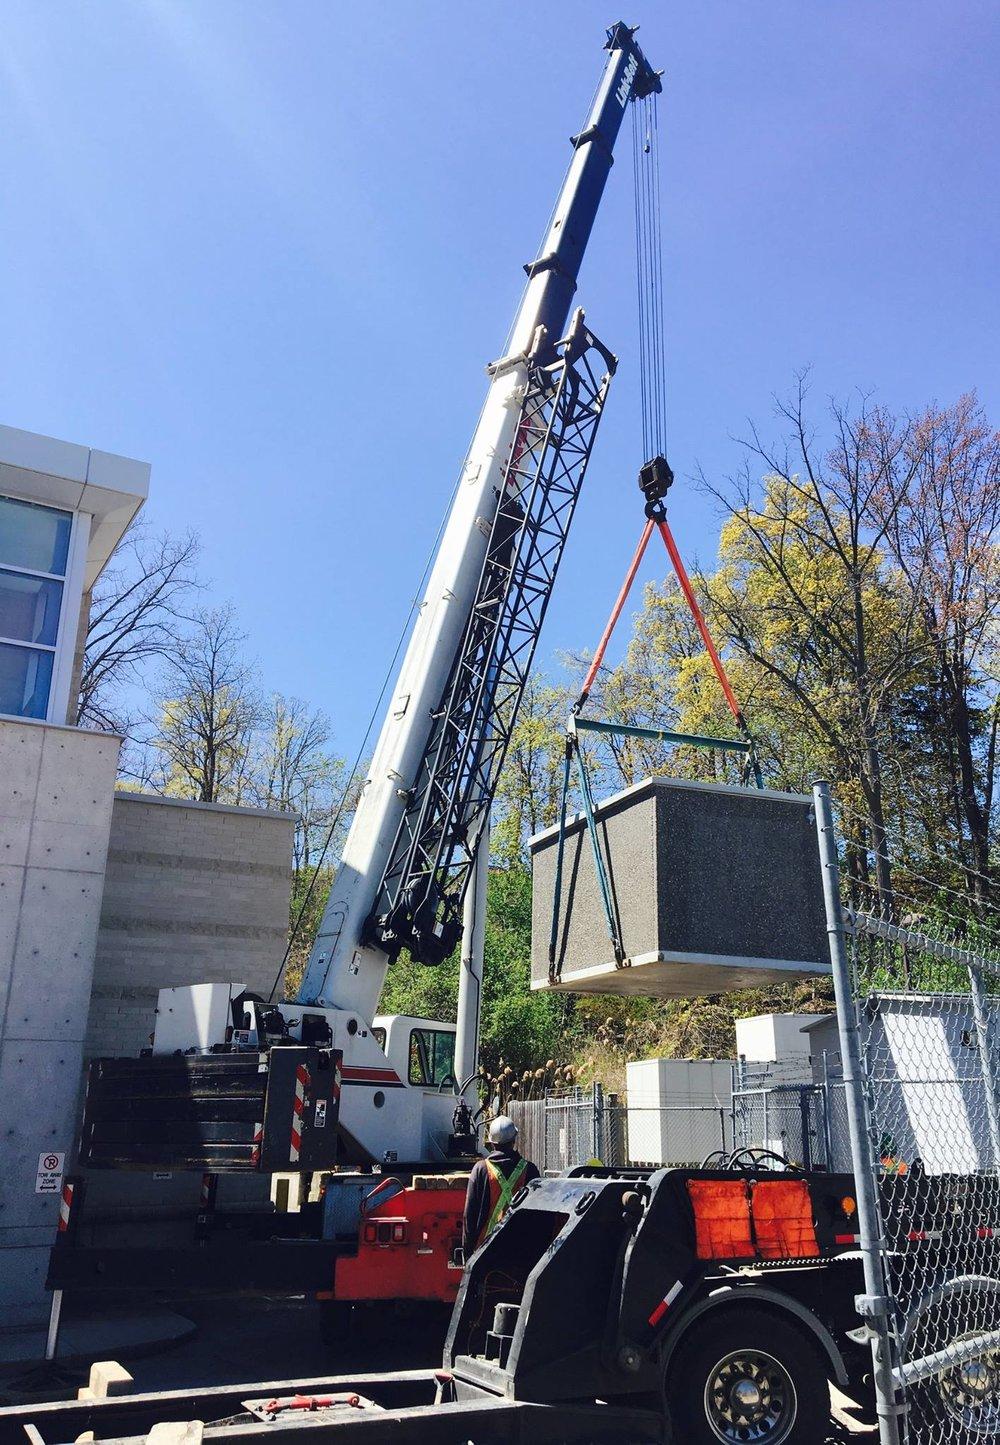 100 ton link belt crane relocating a precast storage shed.